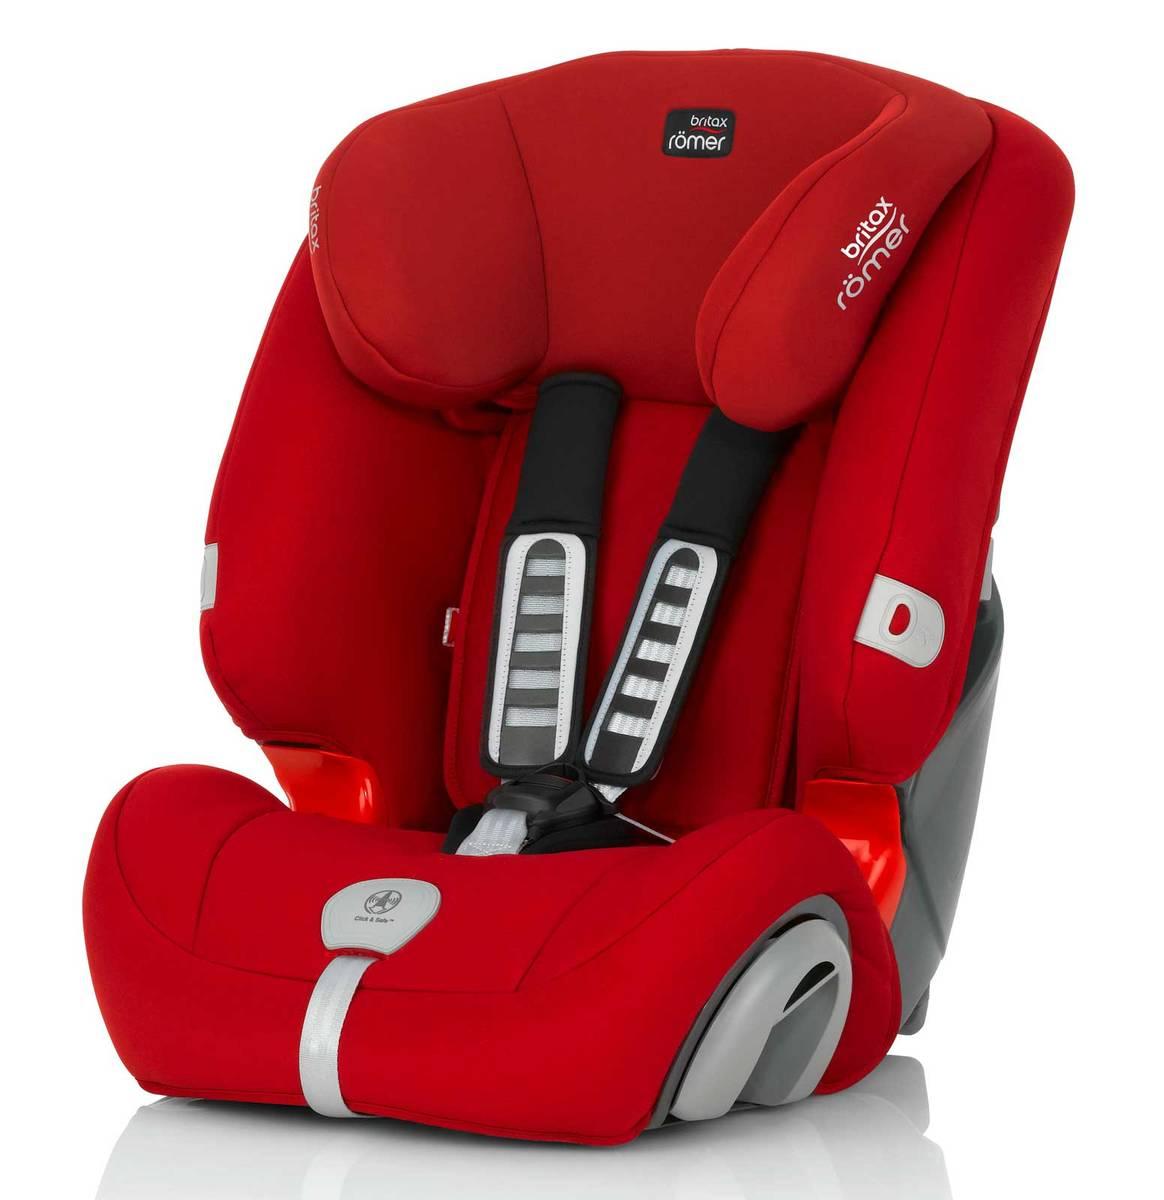 Flame Red 2016 - Turvaistuimet - 5012124059869 - 3